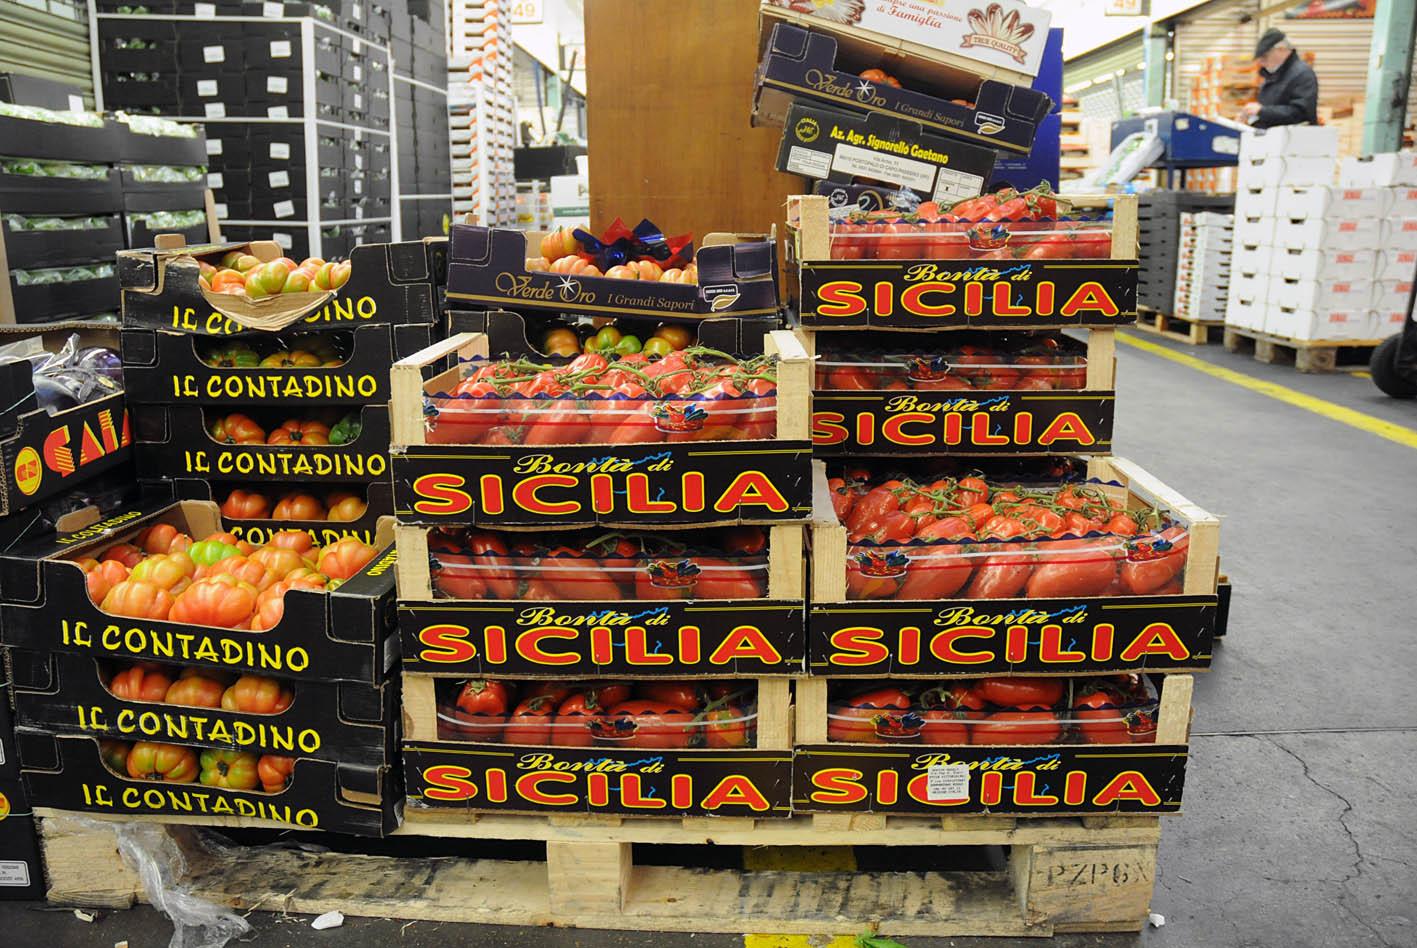 pallet-of-sicilian-tomatoes2.jpg?mtime=20170922143751#asset:11536